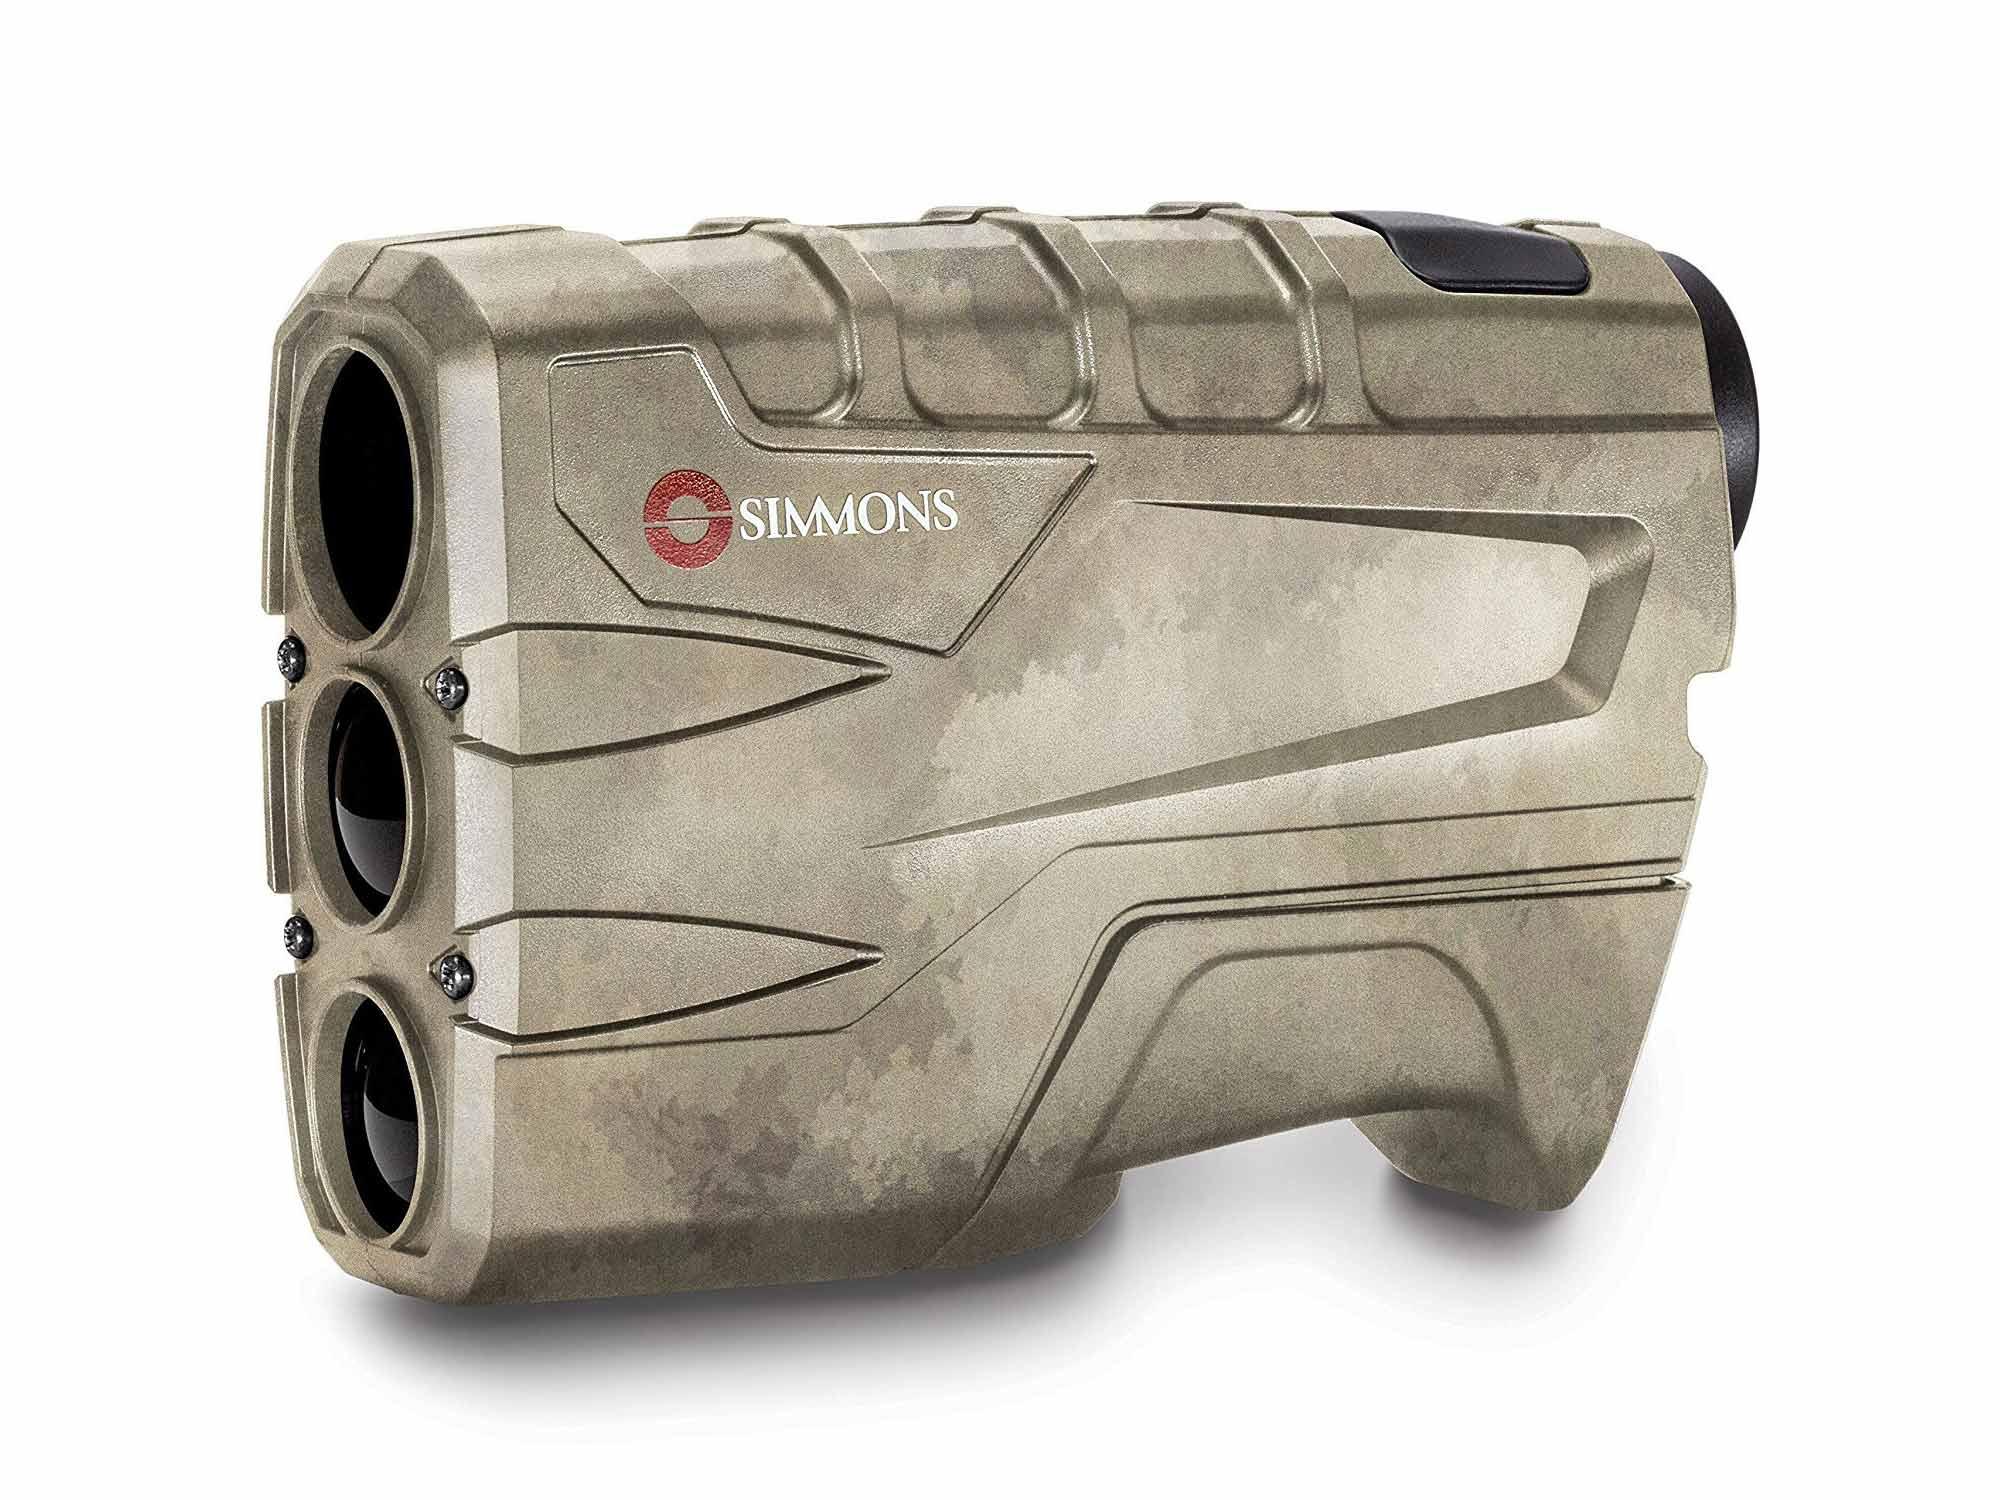 Simmons Volt Laser Rangefinder